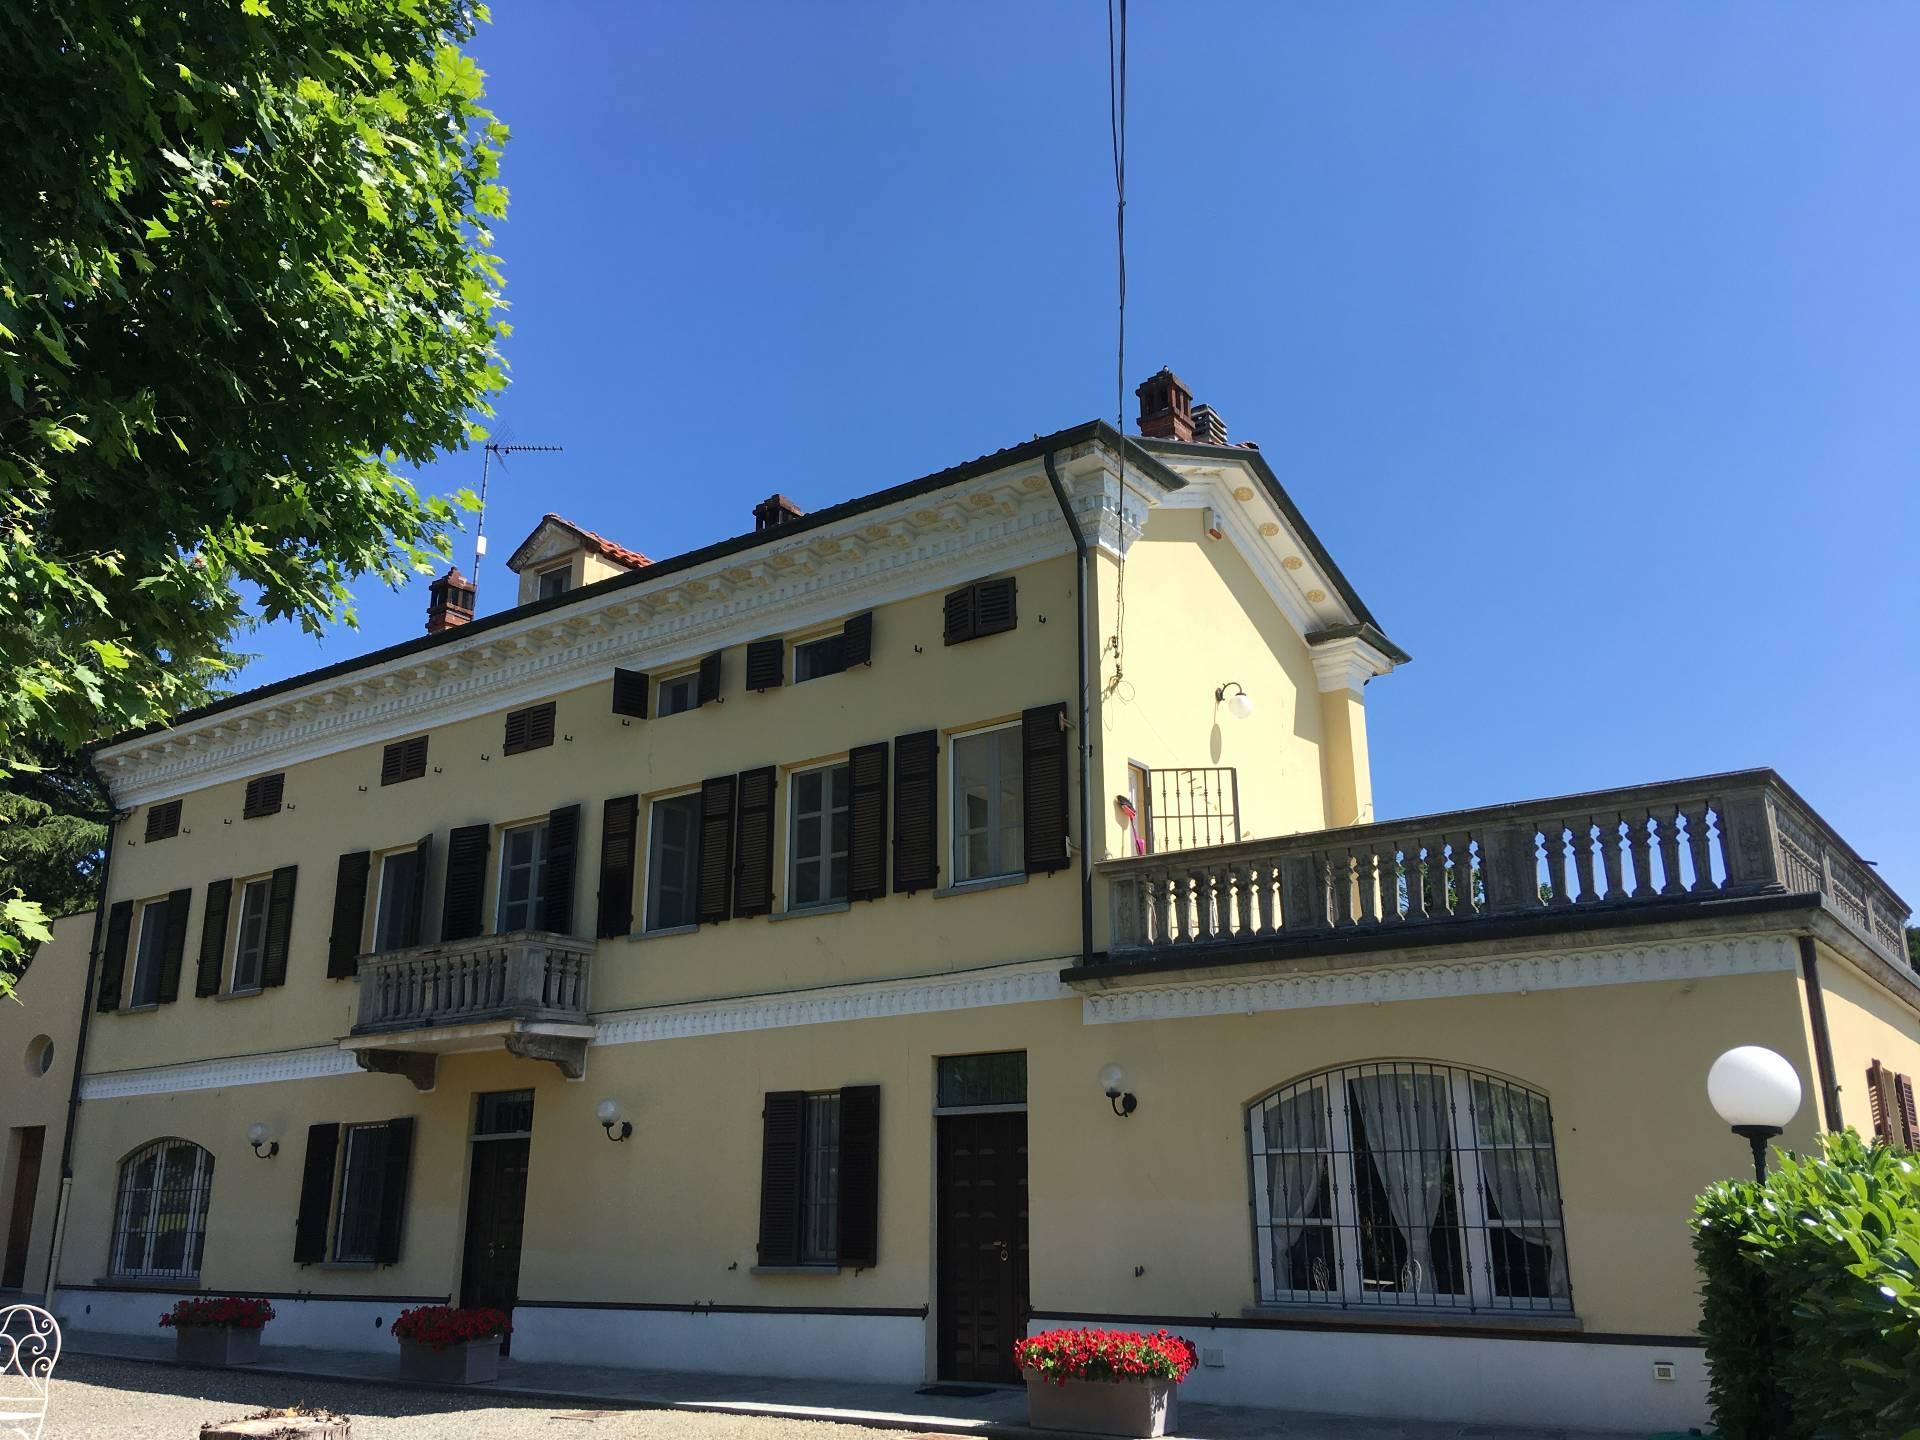 Pietra Marazzi, Strada per Pavone